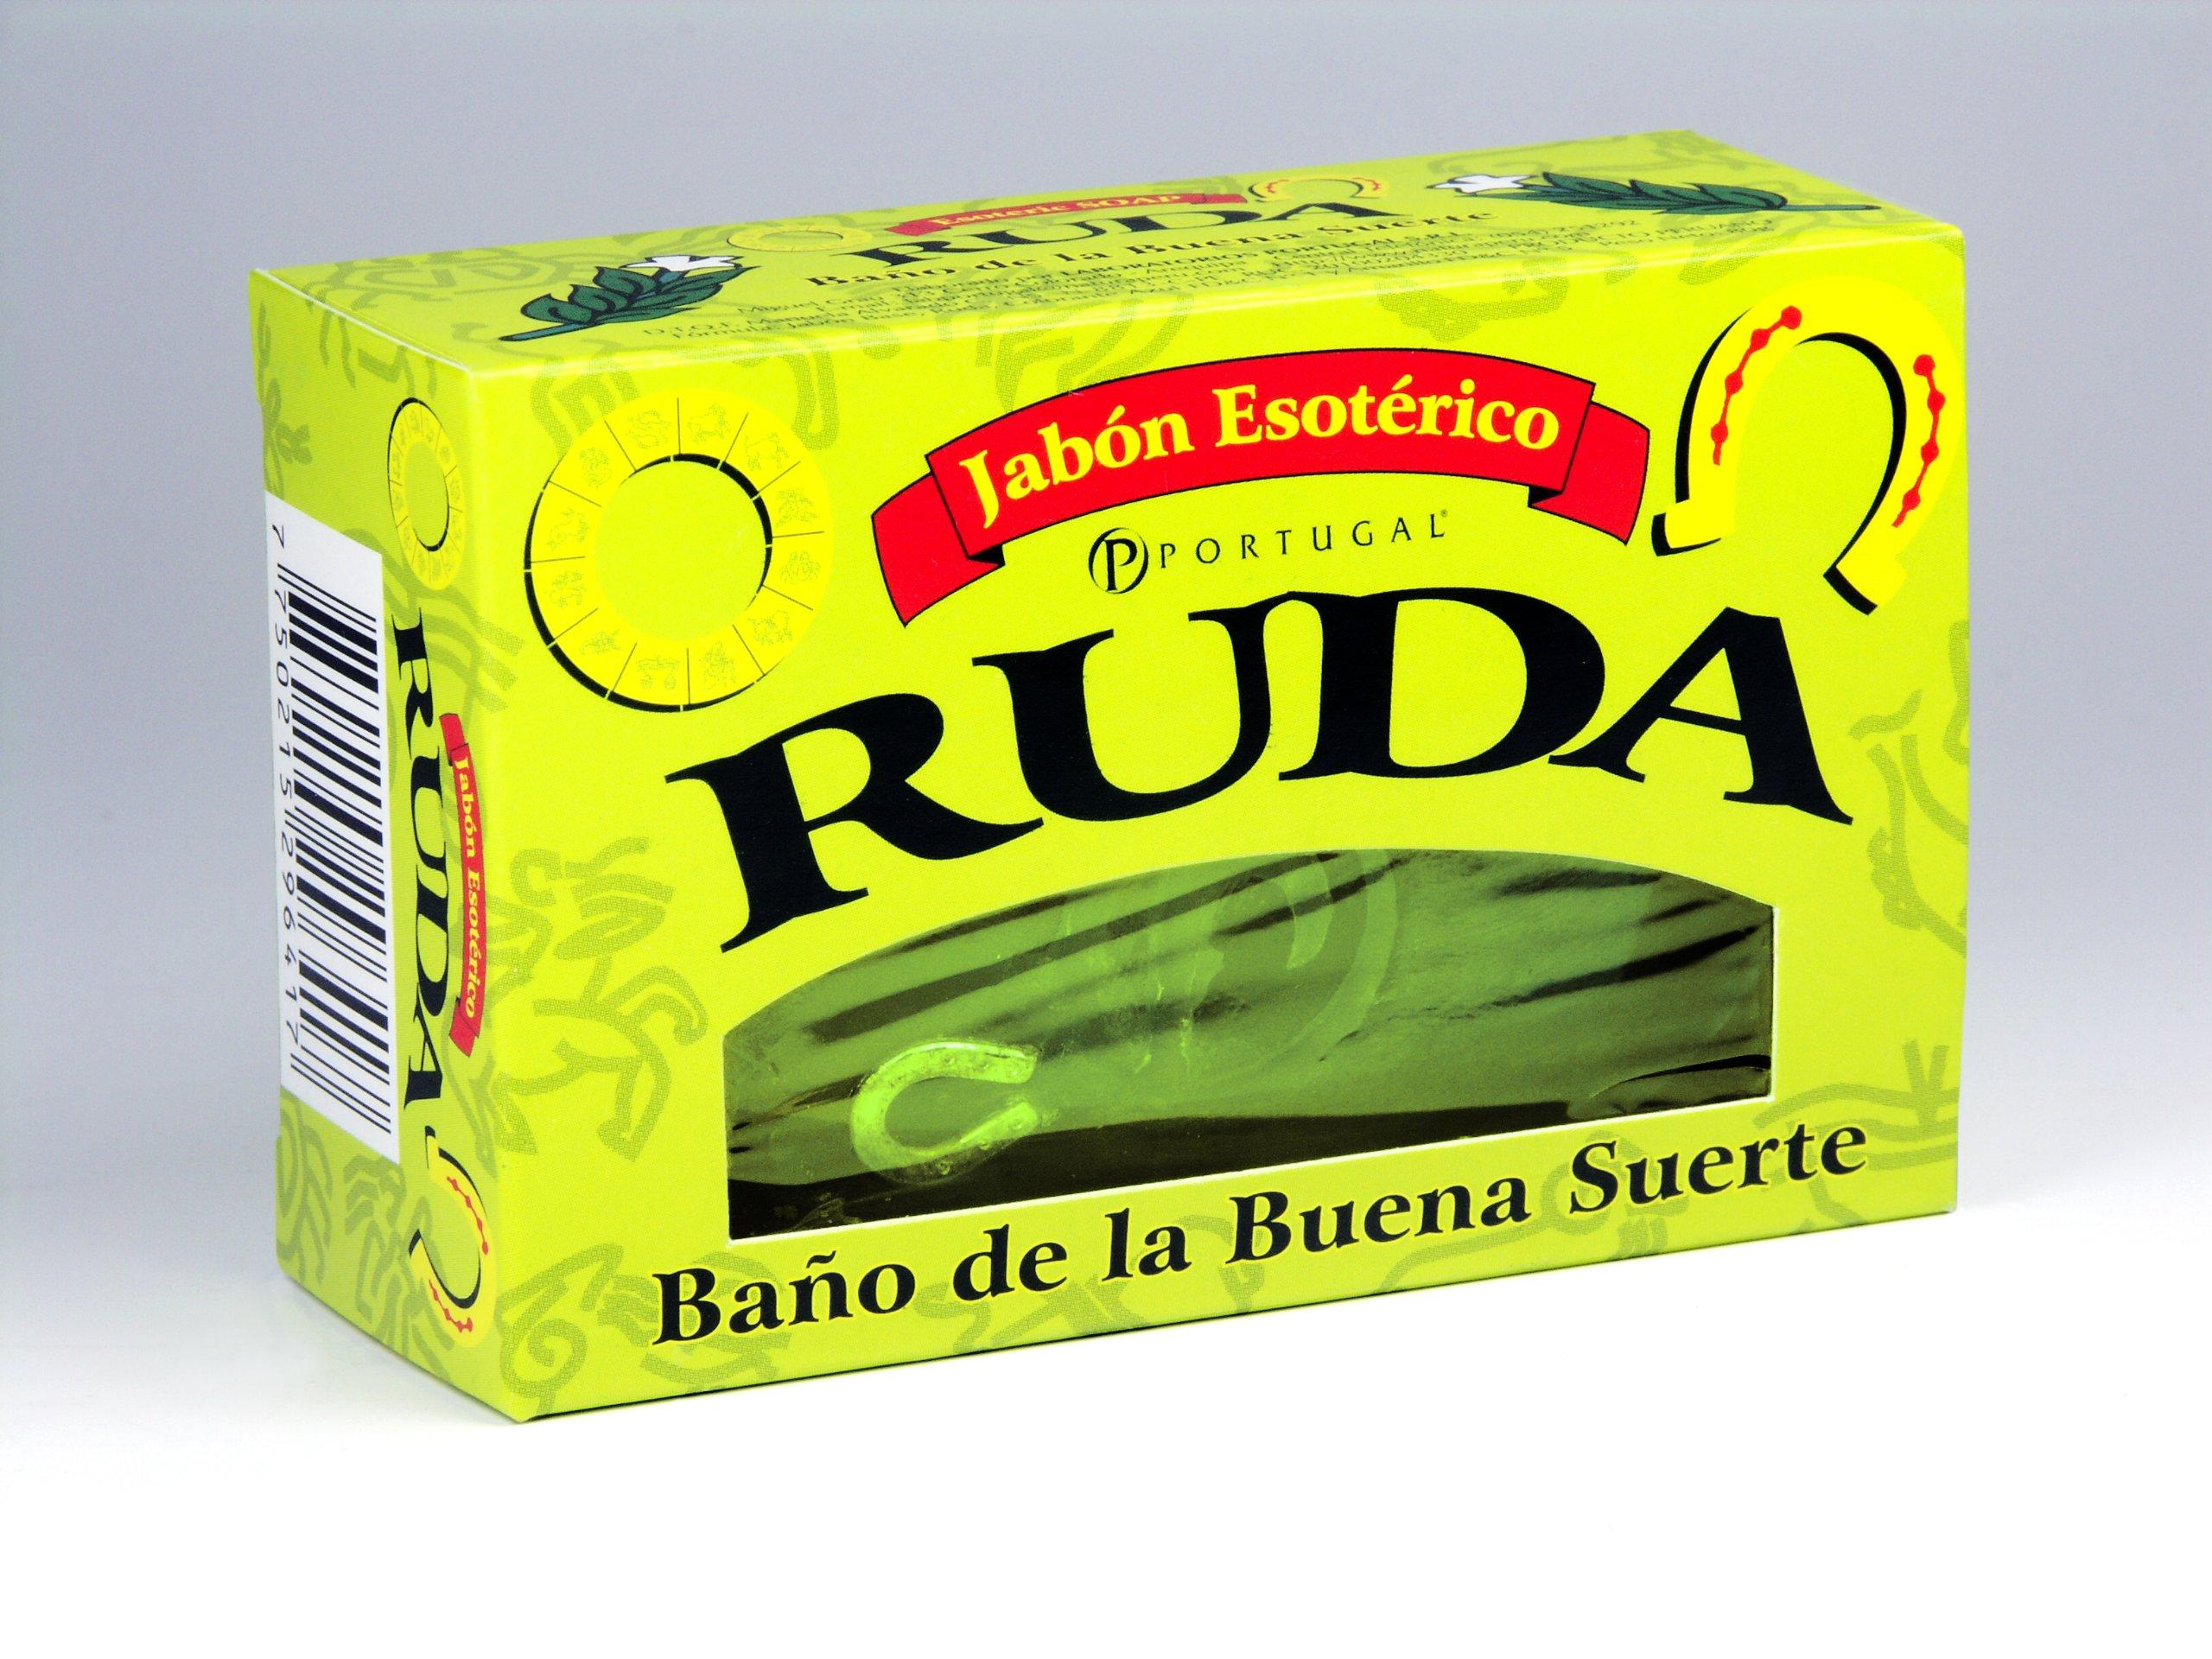 Jabon Ruda: Rue Soap 3-pack